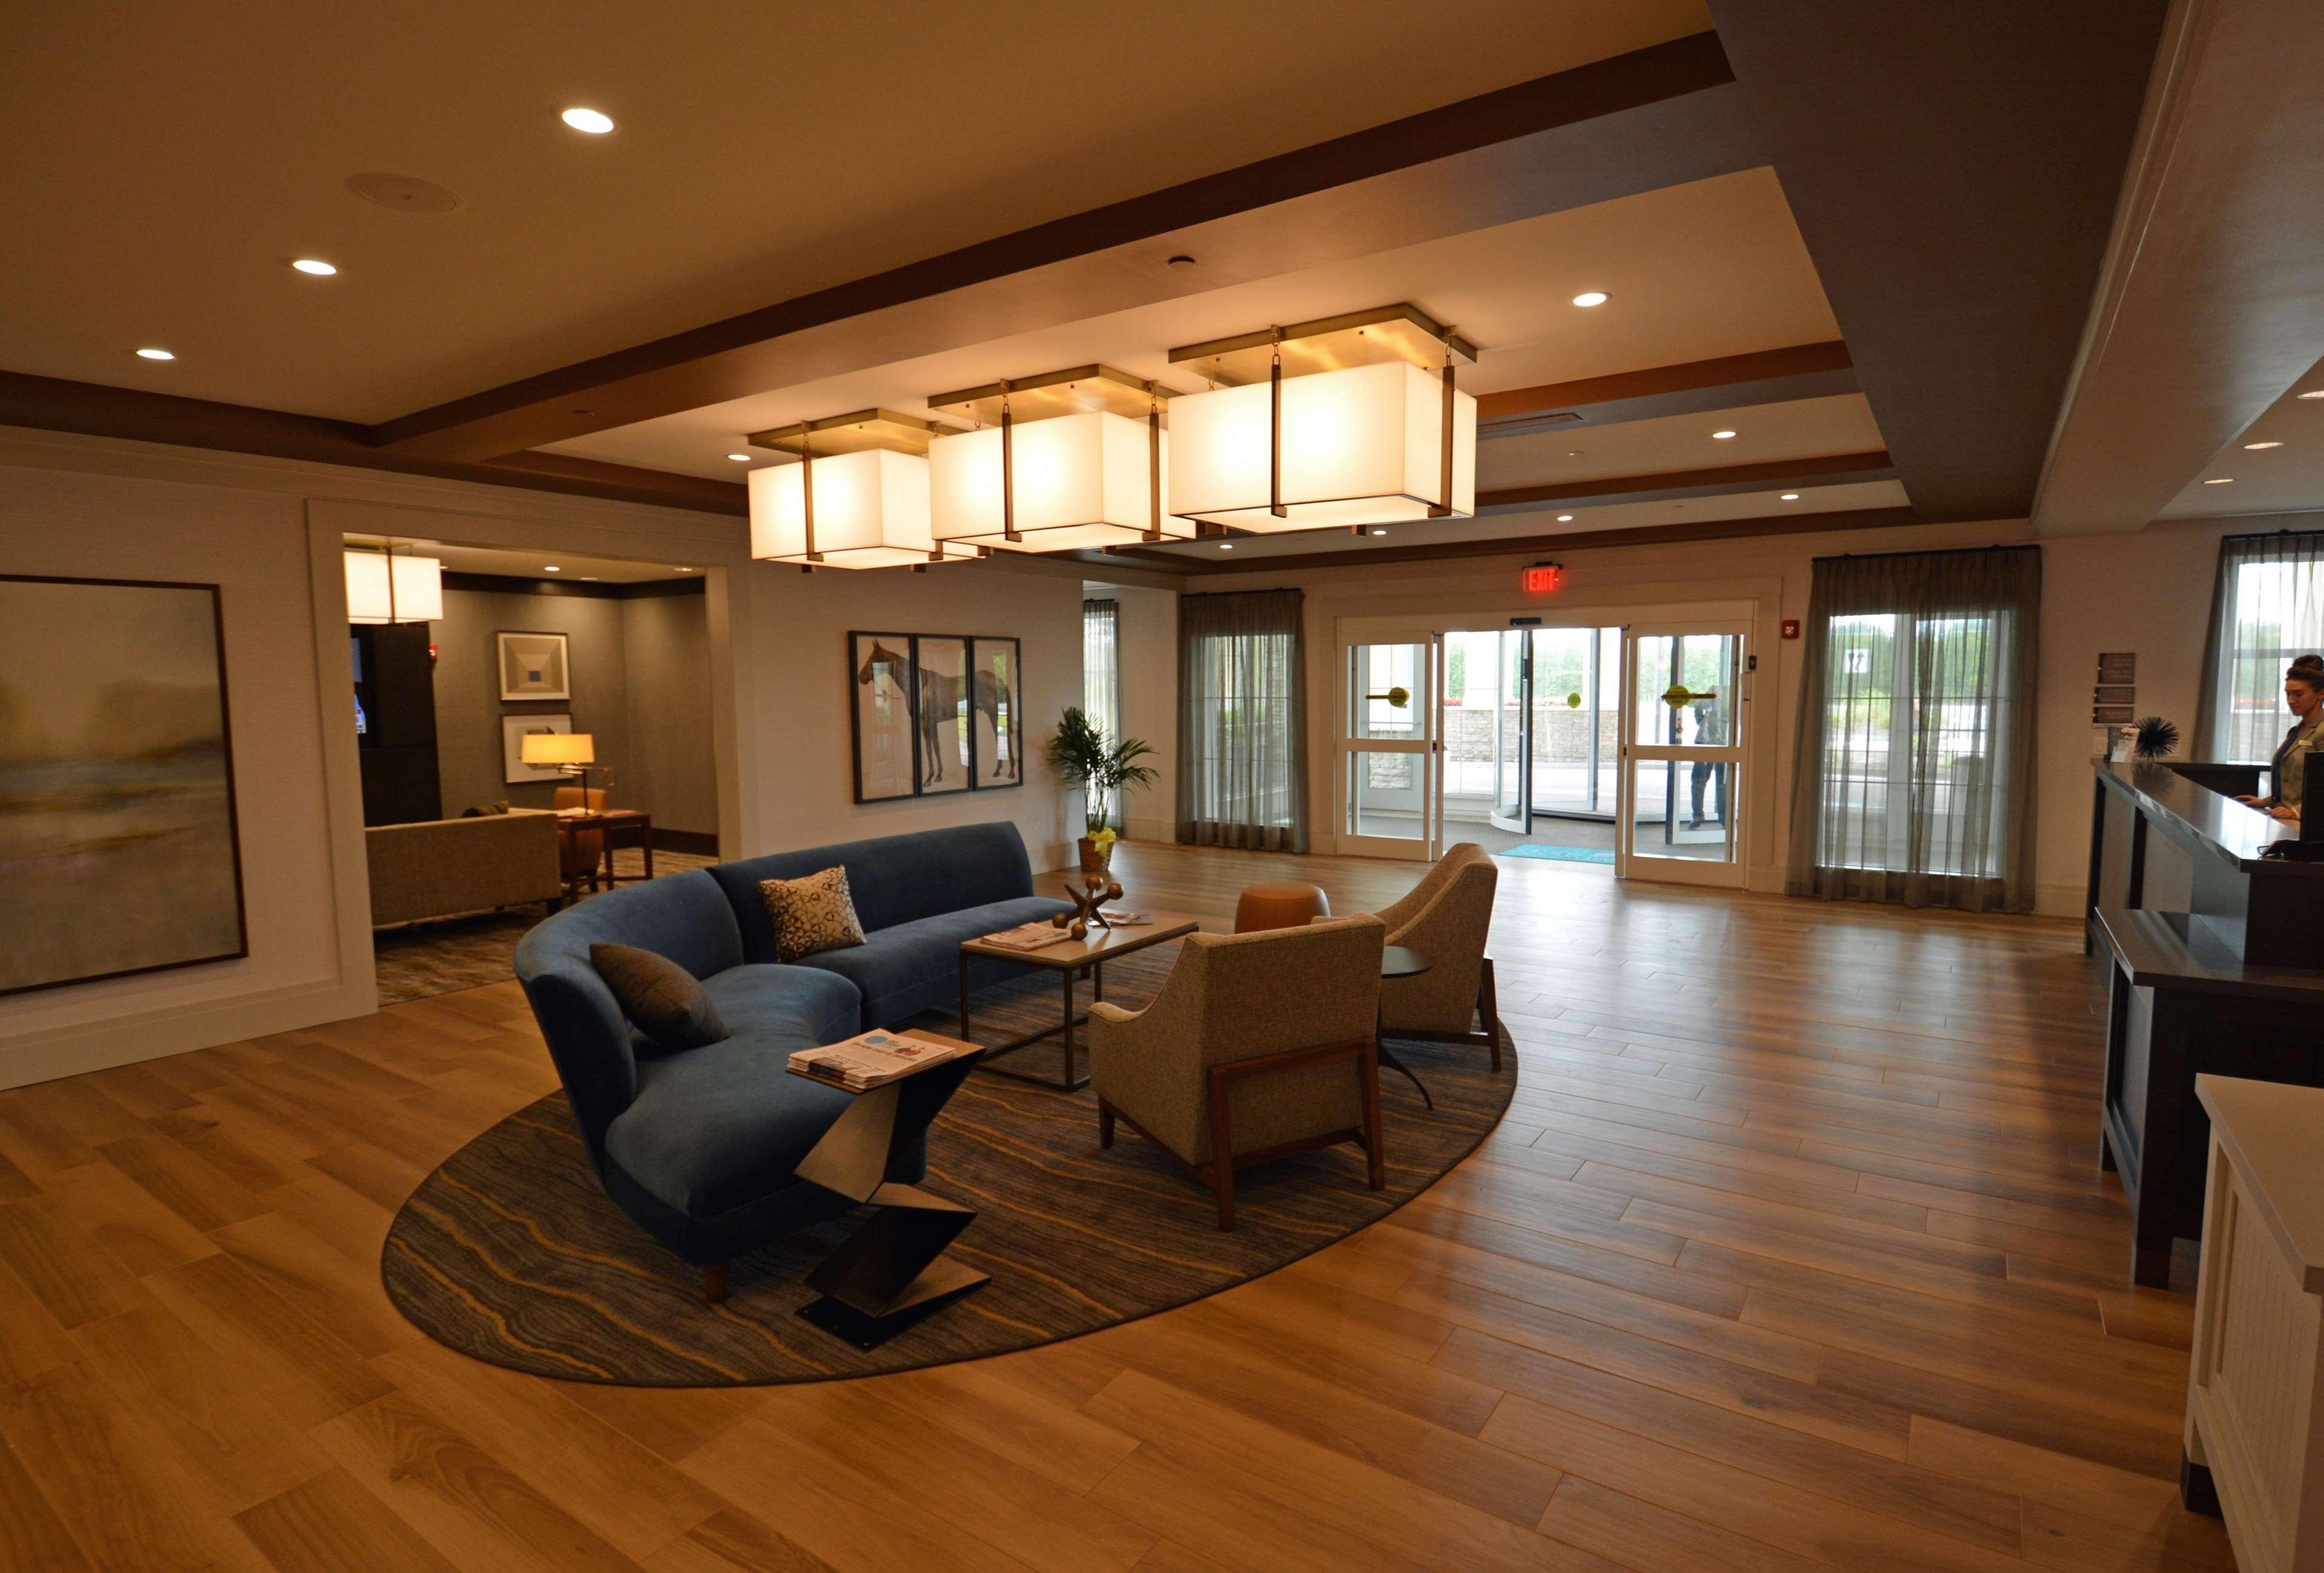 Homewood Suites by Hilton Saratoga Springs image 23